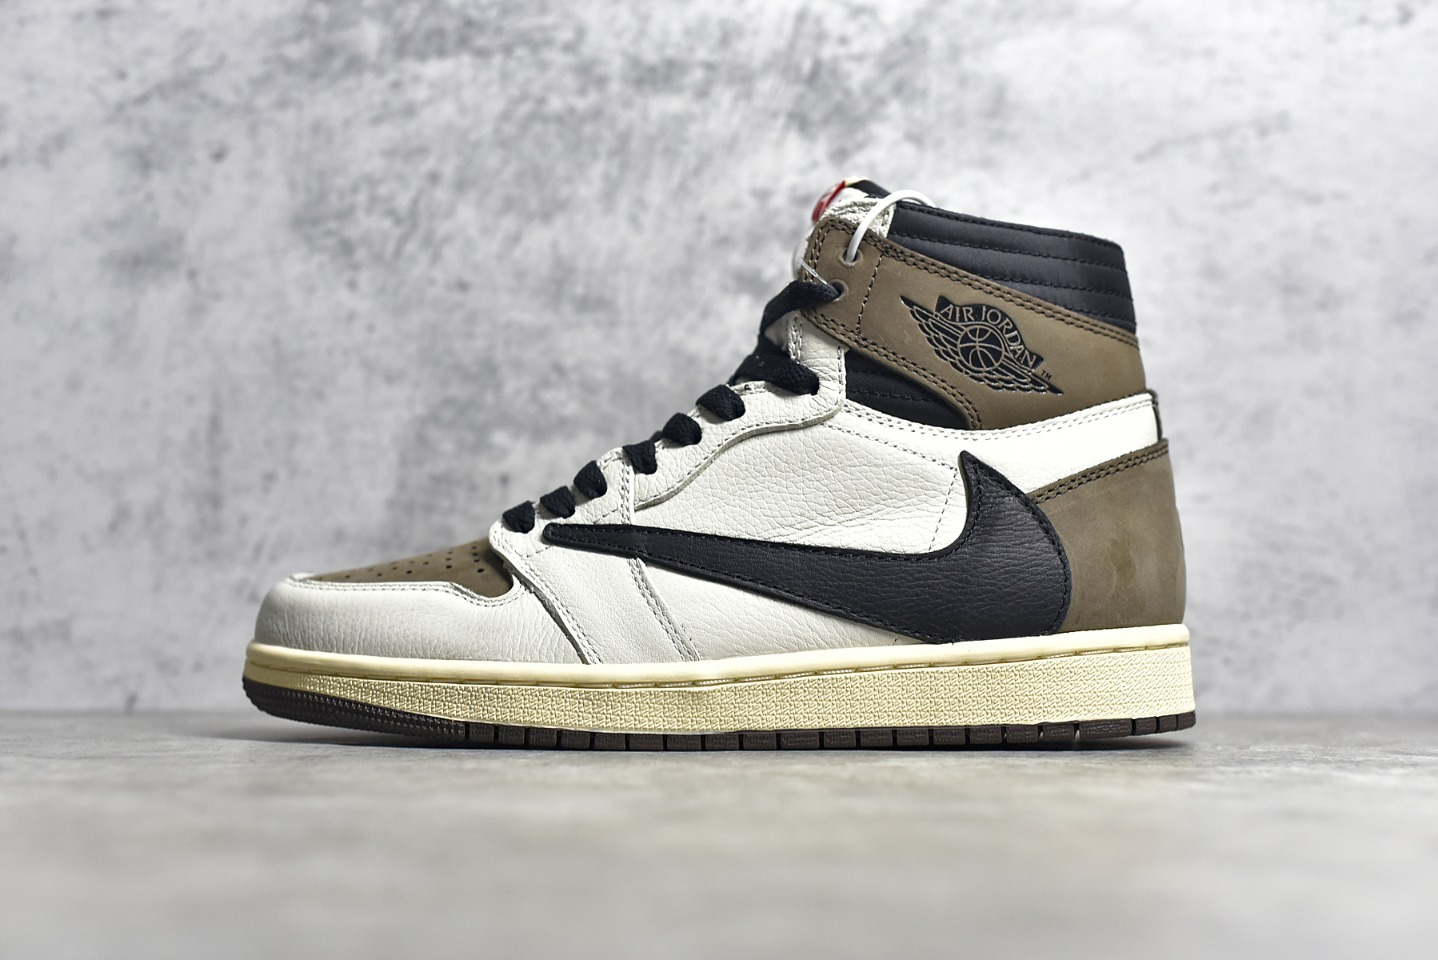 AJ1斯科特联名倒钩 Travis Scott x Air Jordan 1纯原版本AJ1白粽拼接鞋面 货号:555088-105-潮流者之家